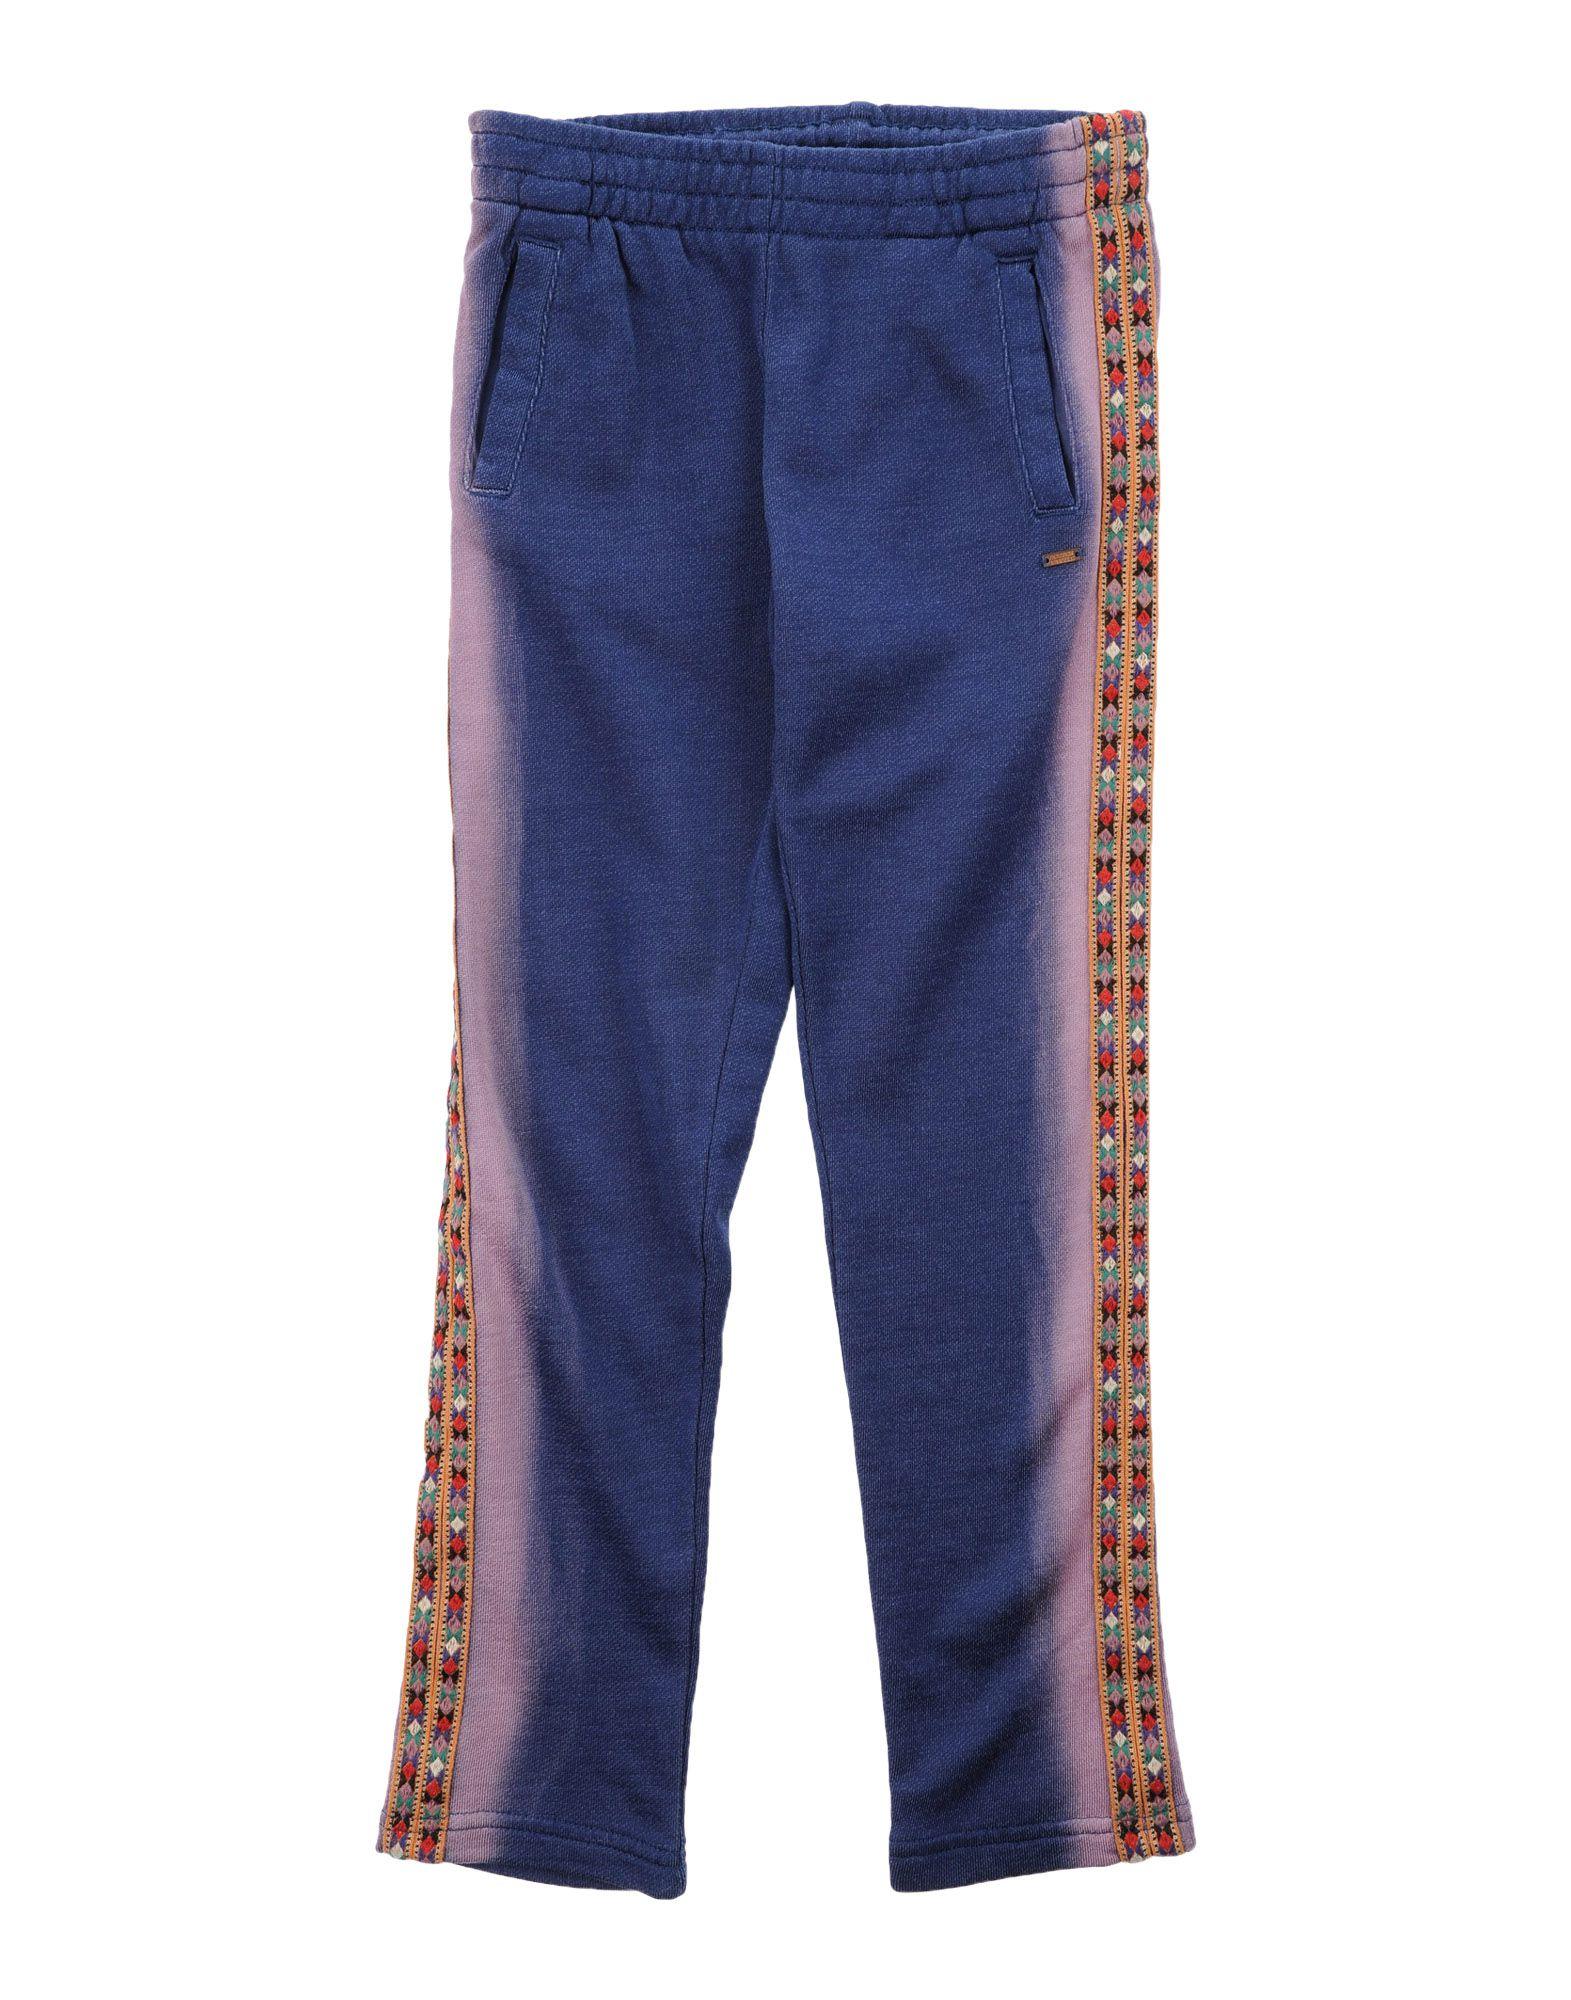 SCOTCH R'BELLE ガールズ 3-8 歳 パンツ ブルー 8 コットン 55% / レーヨン 45%